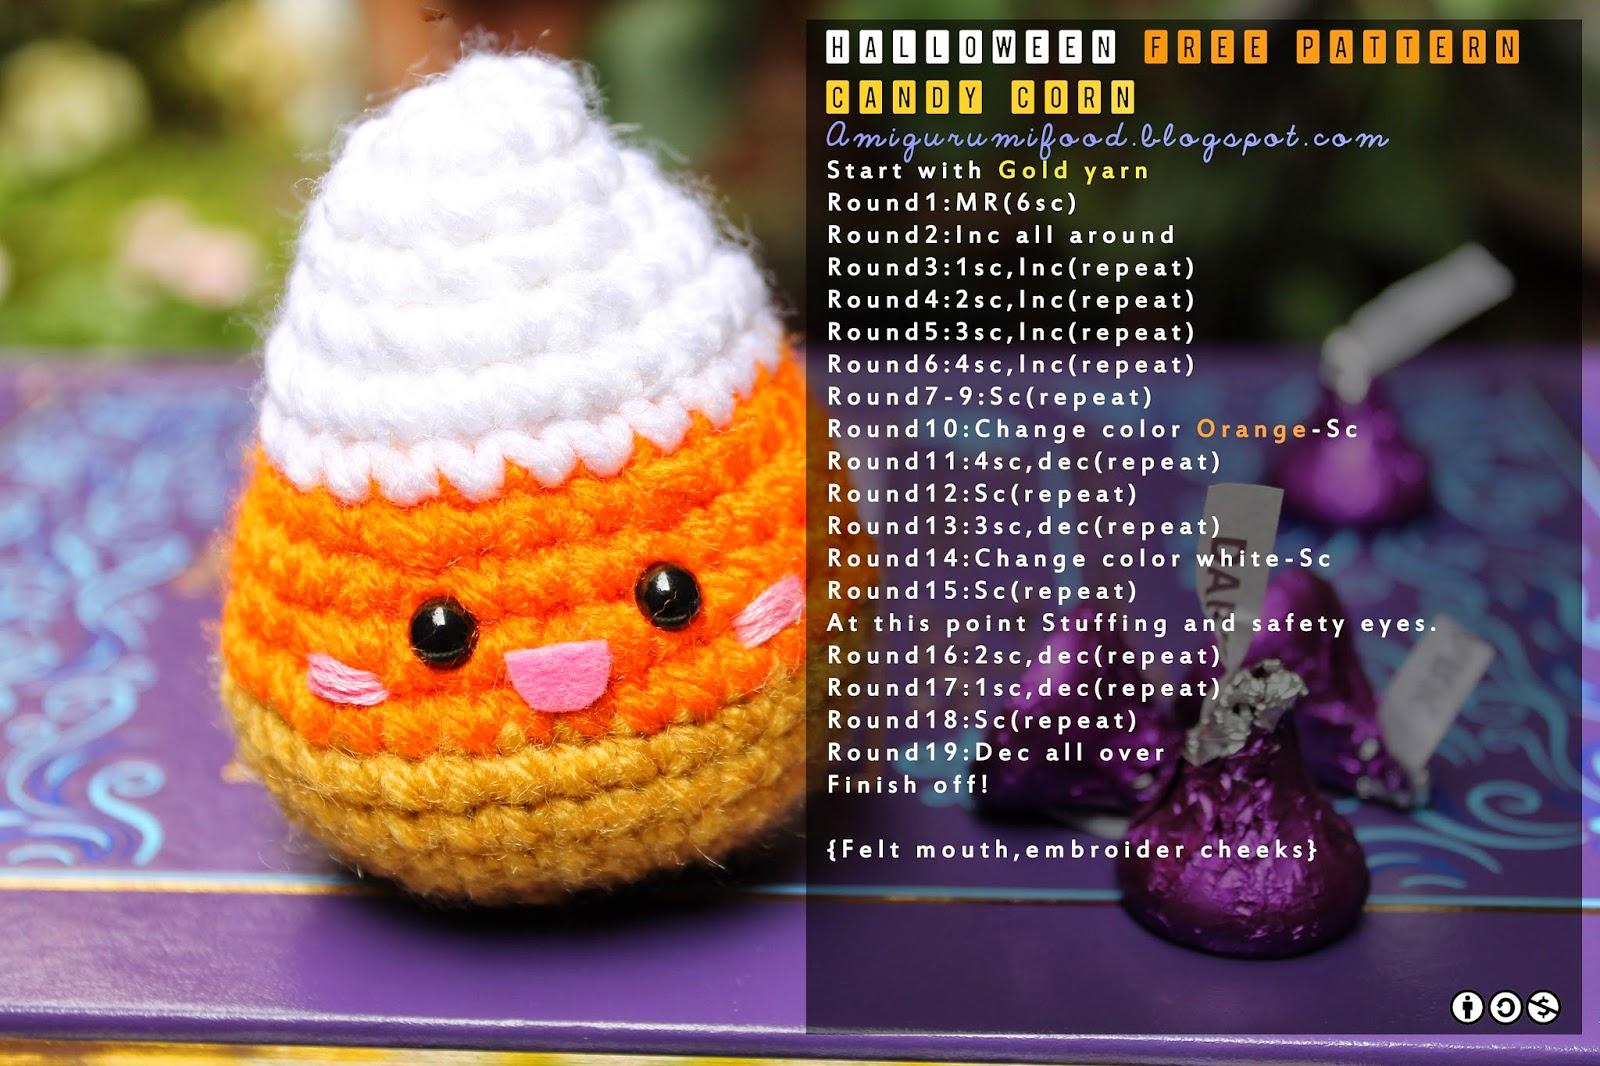 Amigurumi Halloween Patrones : 10 Patrones de Amigurumis Gratis para Halloween - Arte Friki